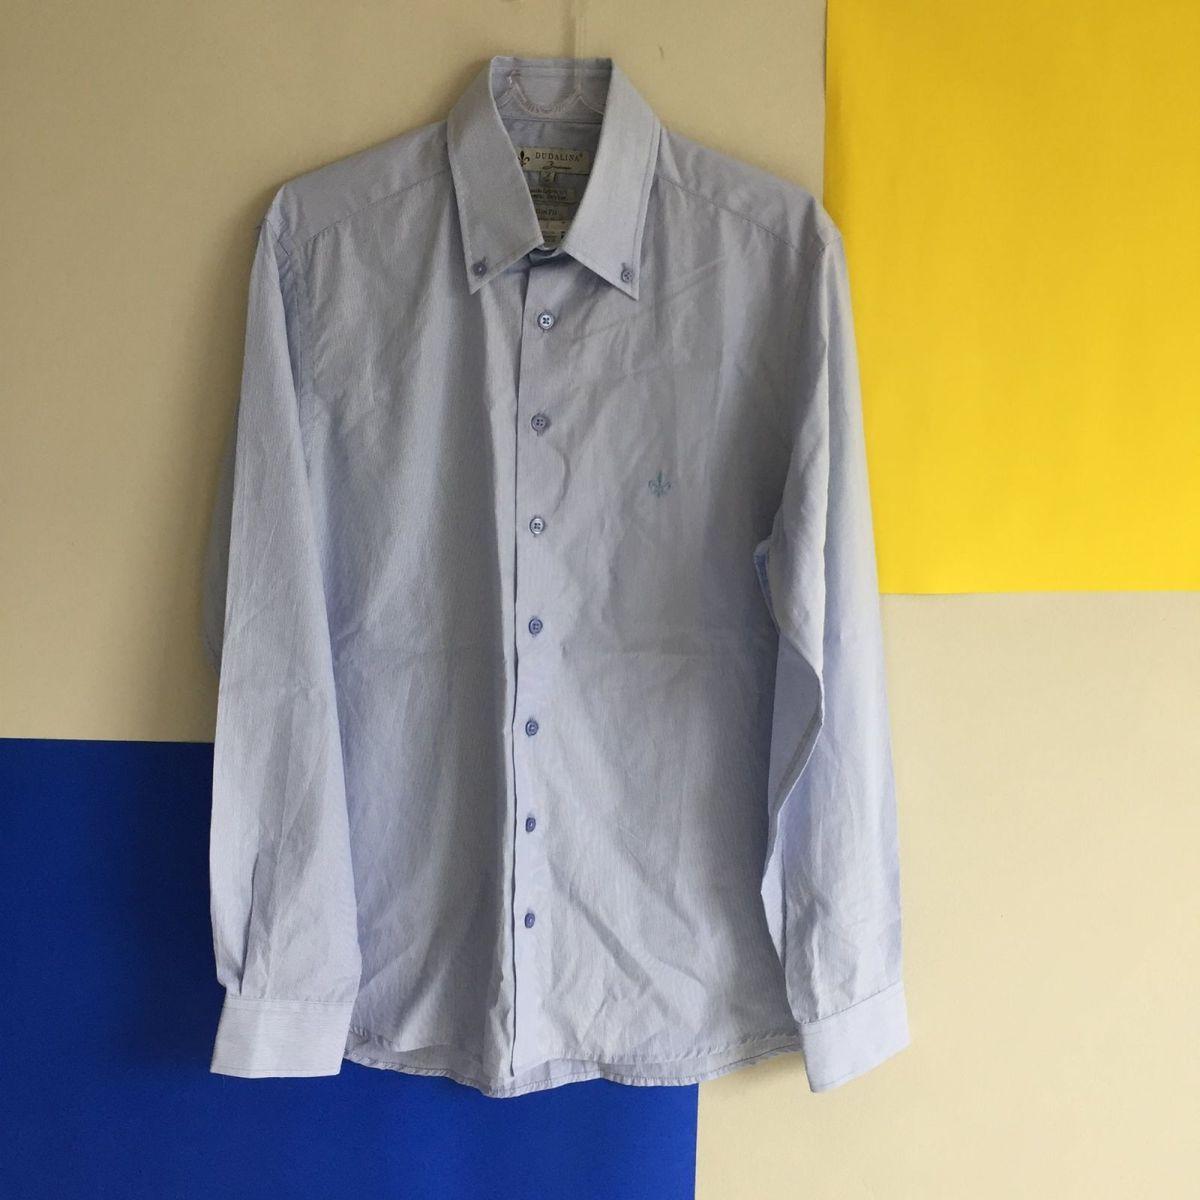 957303c56f Camisa Social Dudalina